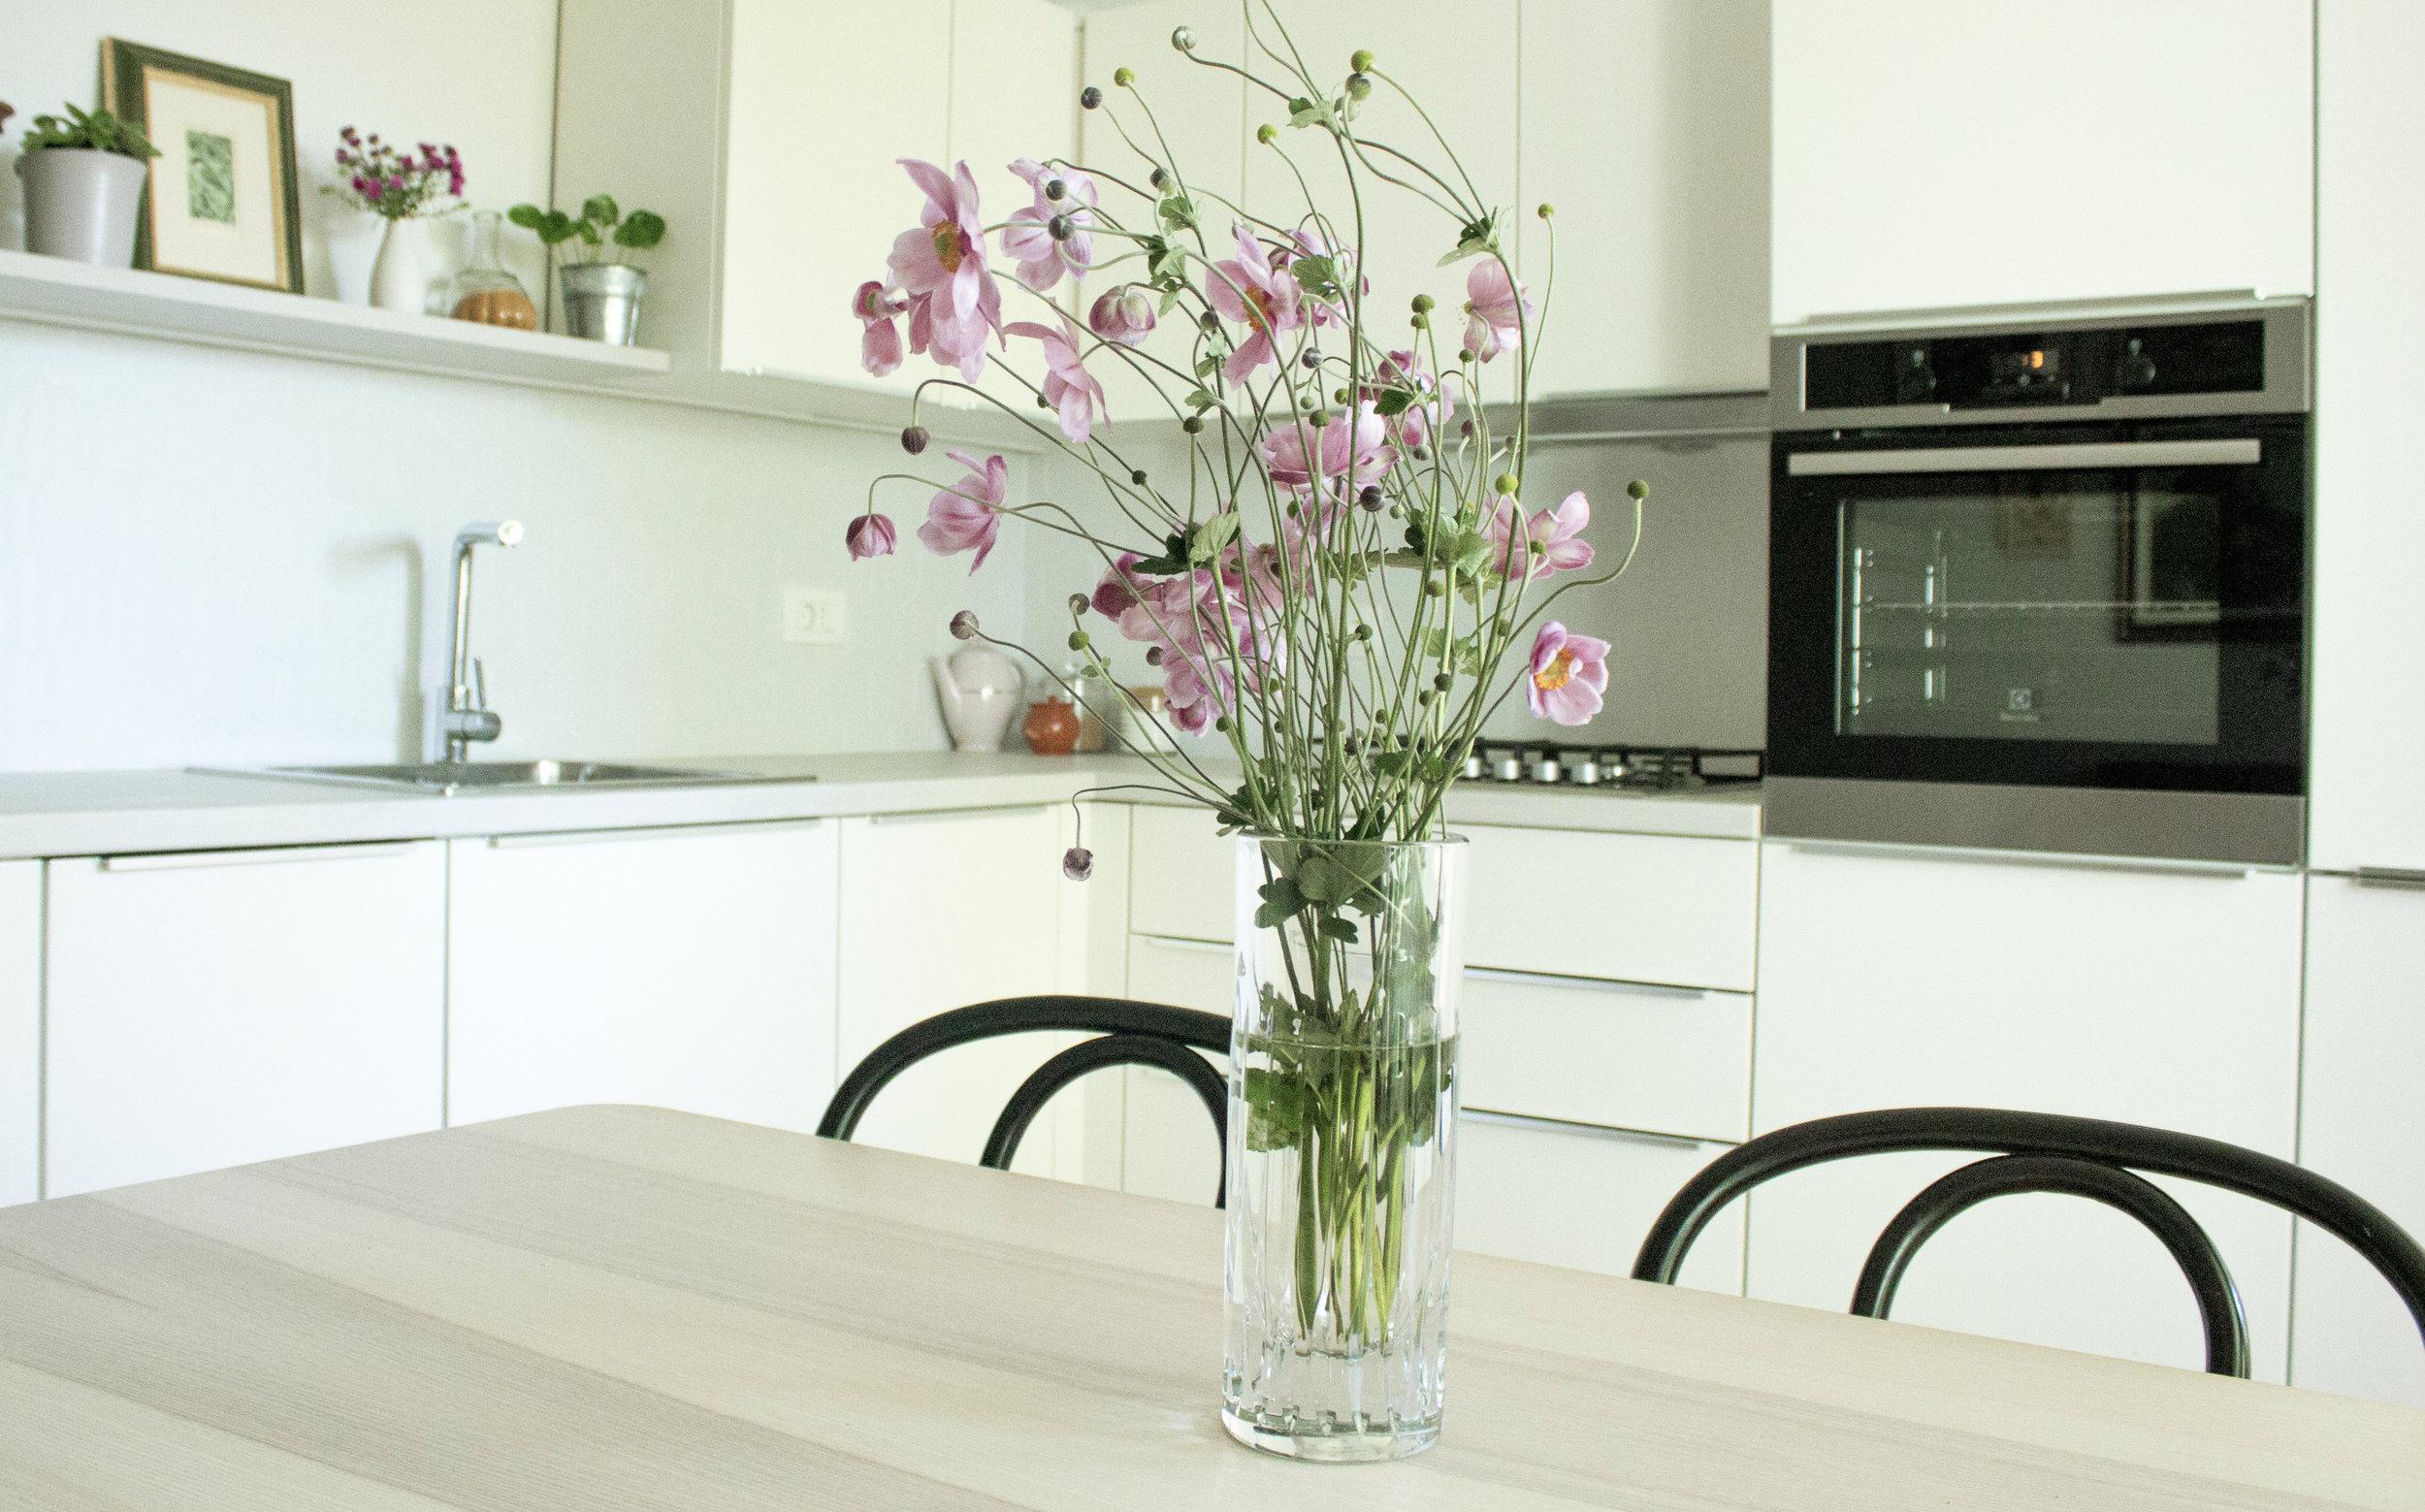 poke studio projekt_ženstvena oaza_kuhinja in jedilnica